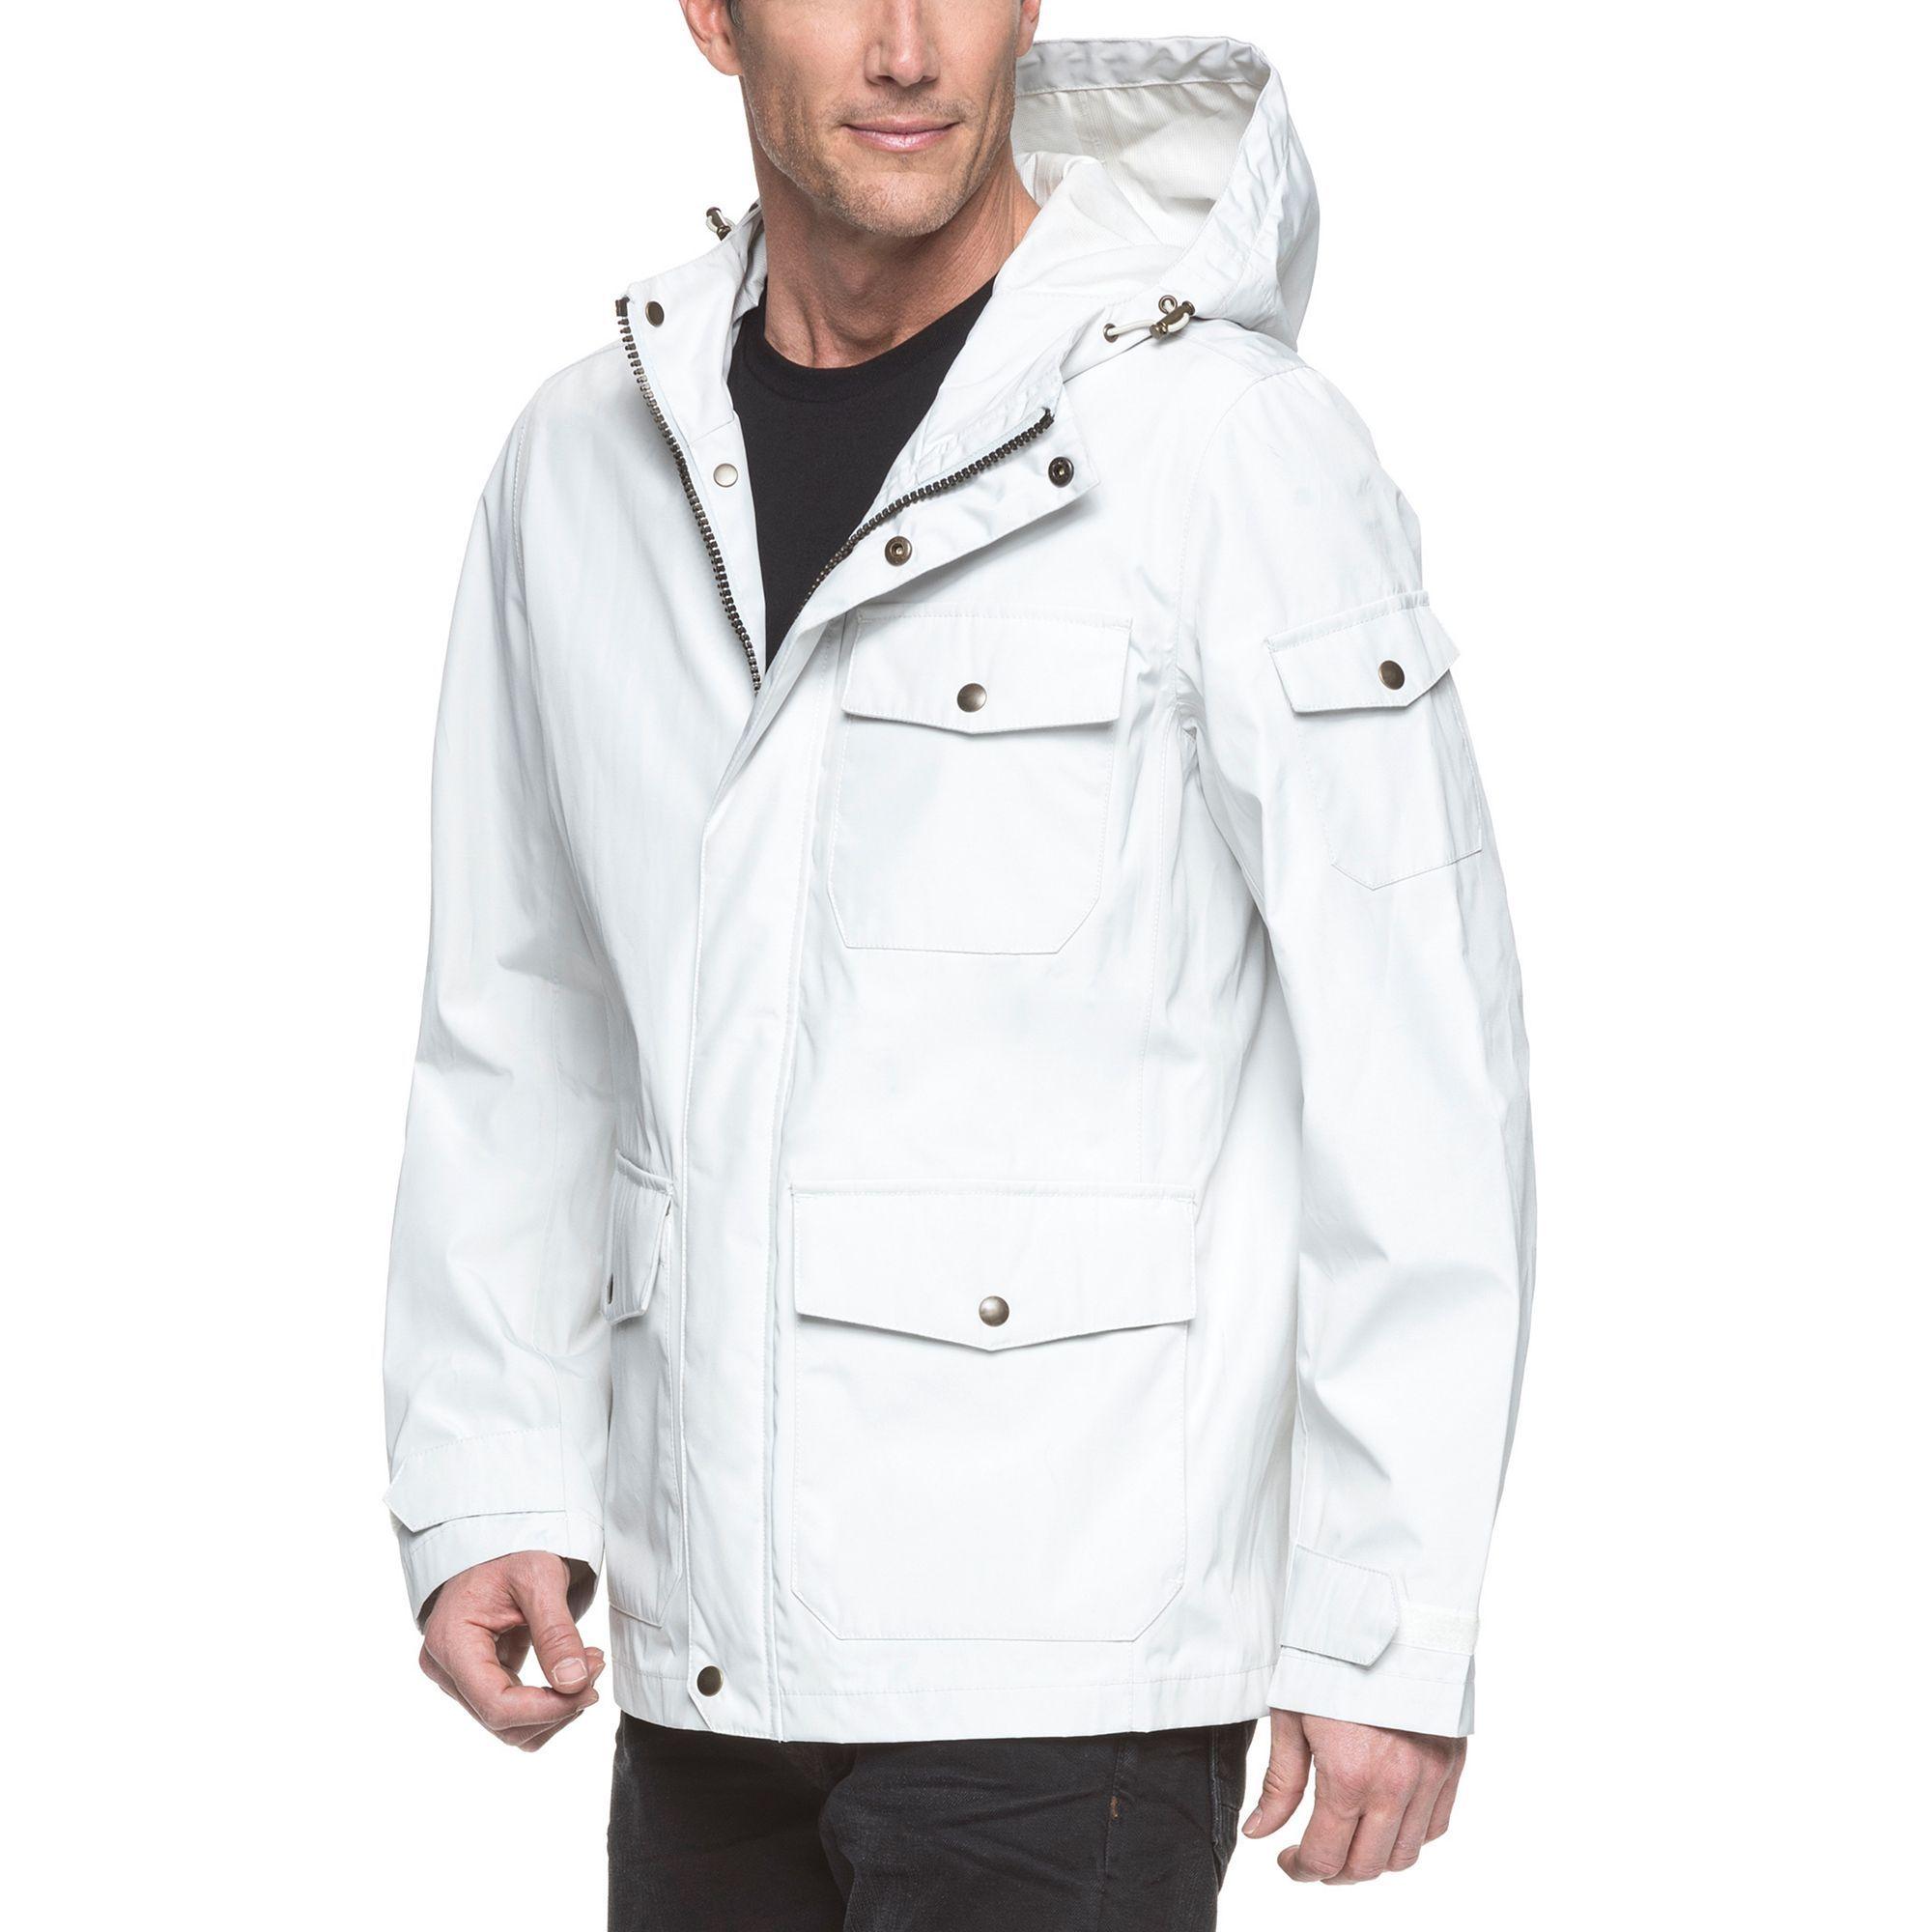 Men's Dockers Rain Jacket Mens rain jacket, Mens